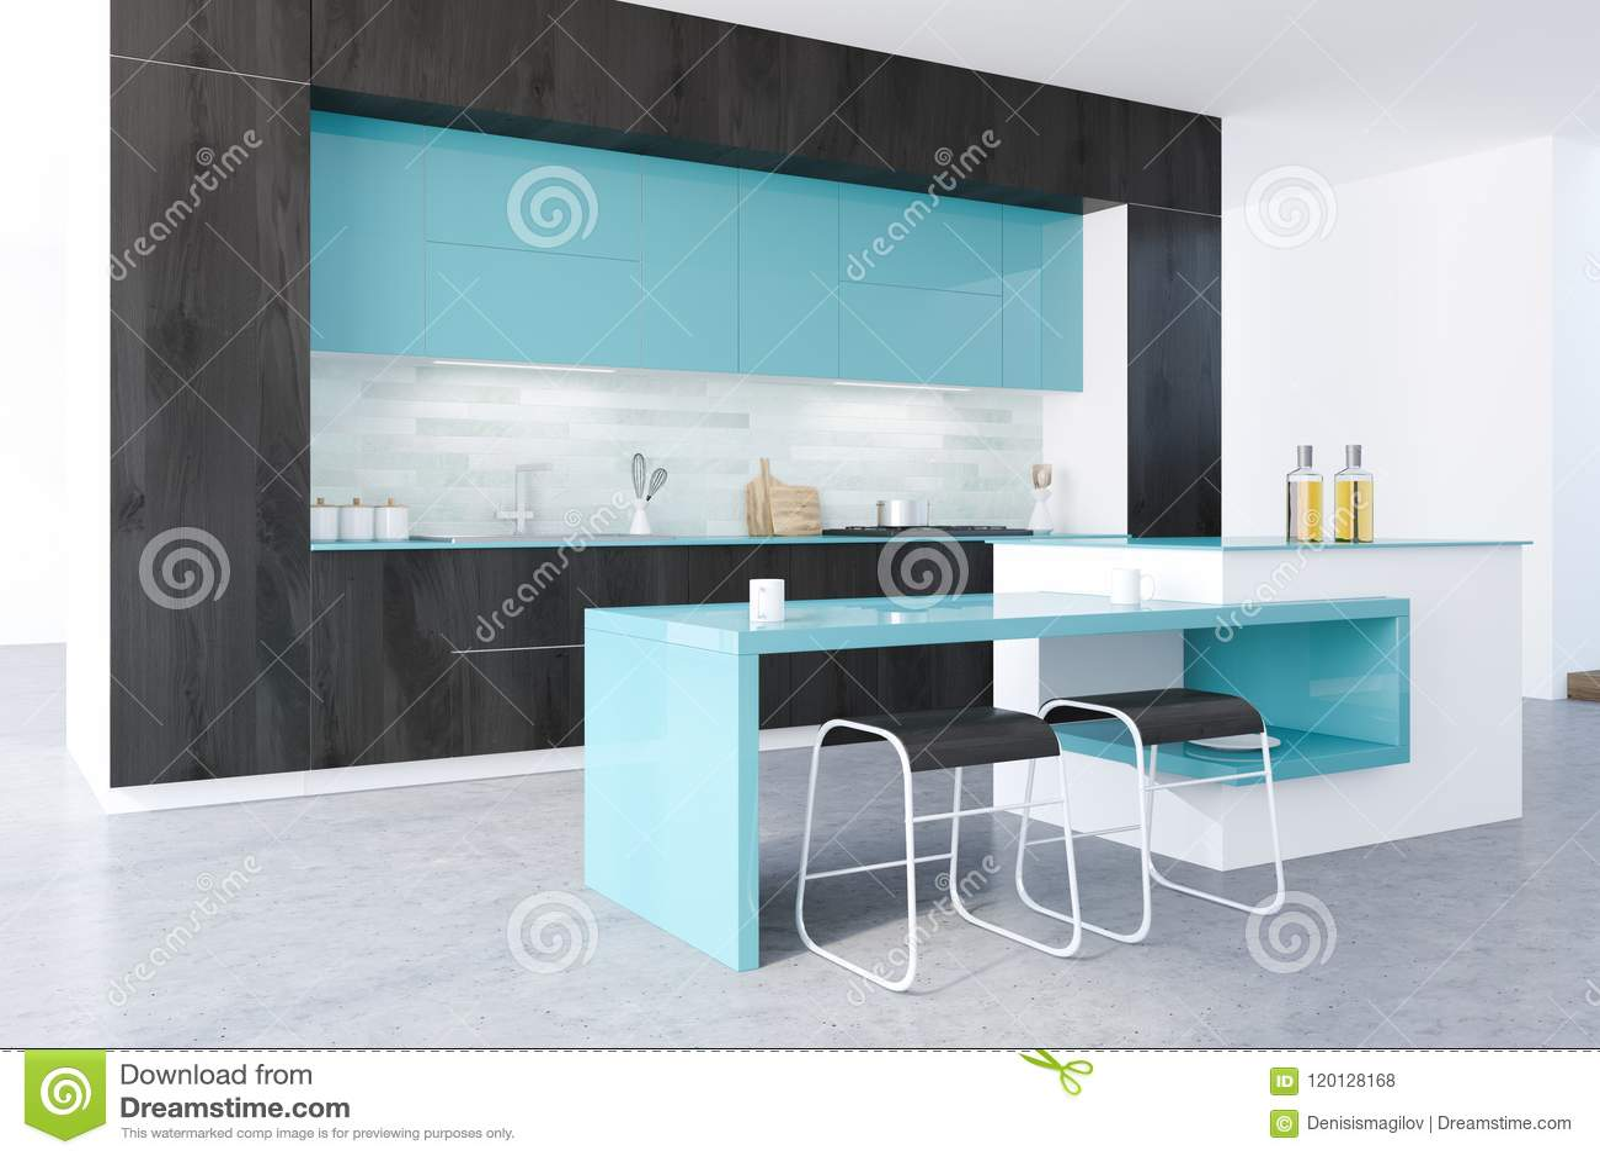 Black And Blue Original Kitchen Stock Illustration - Illustration of ...